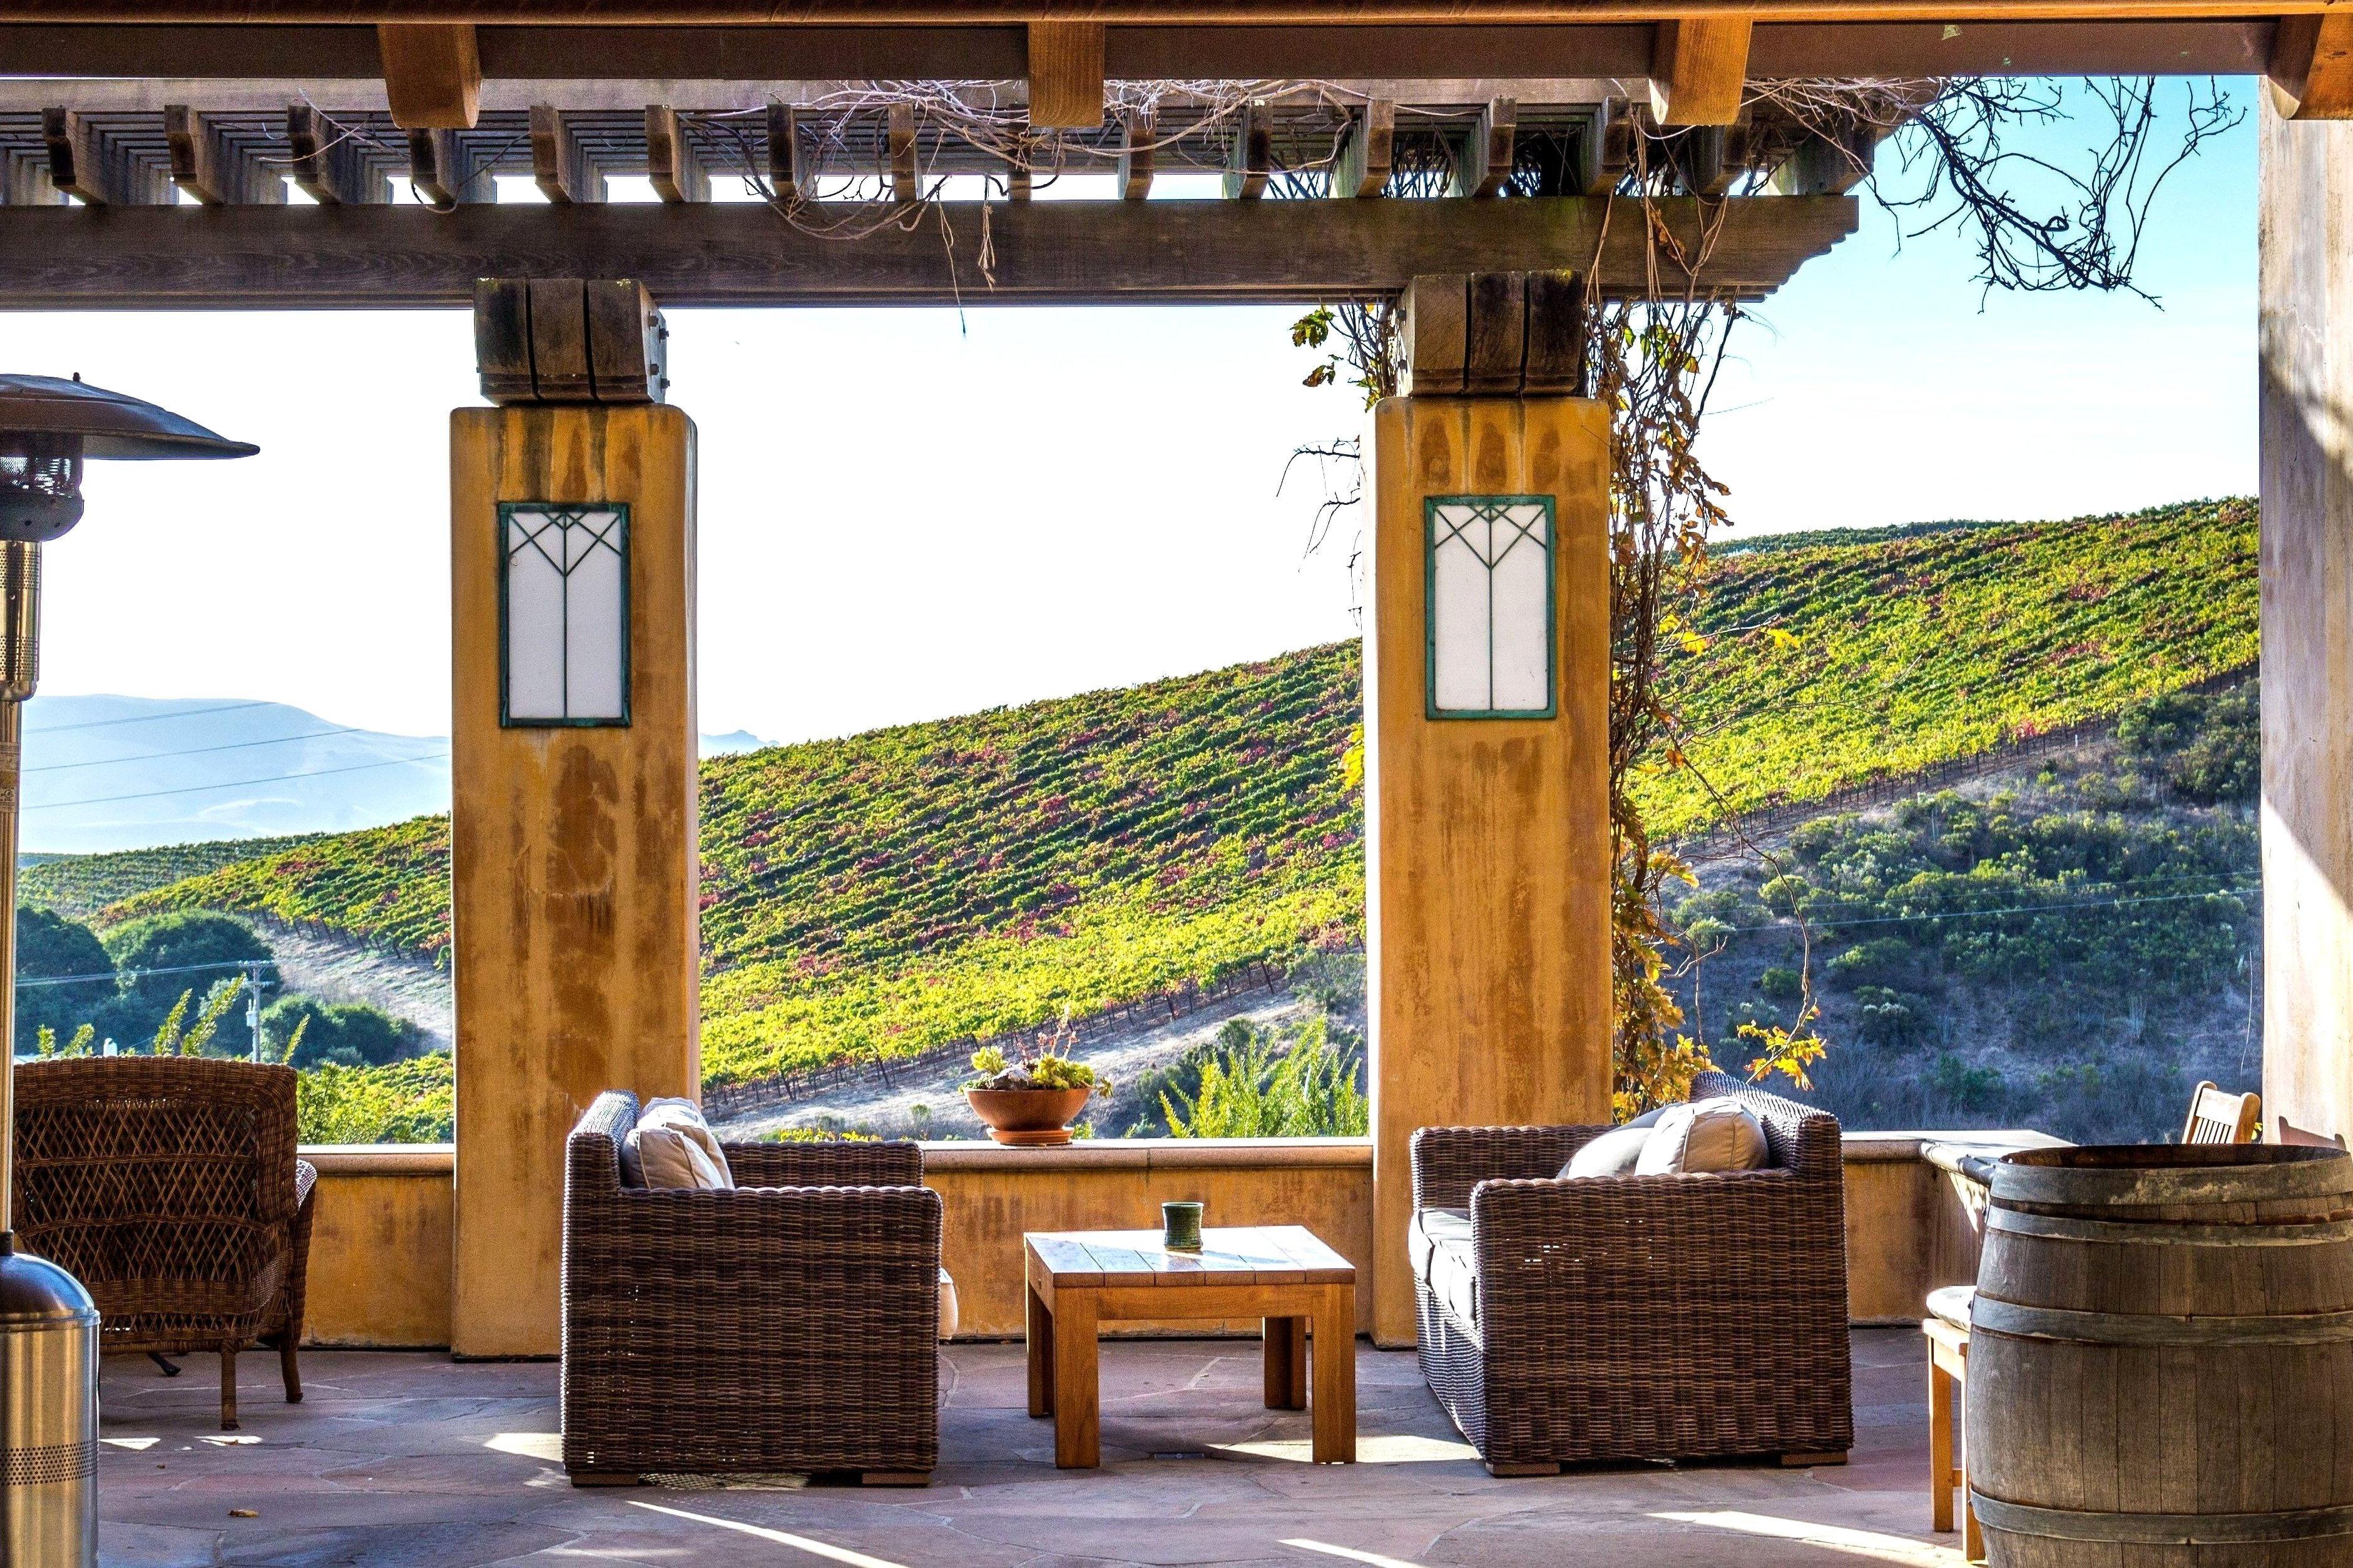 Imagen Gratis Muebles Silla Mesa Terraza Arquitectura